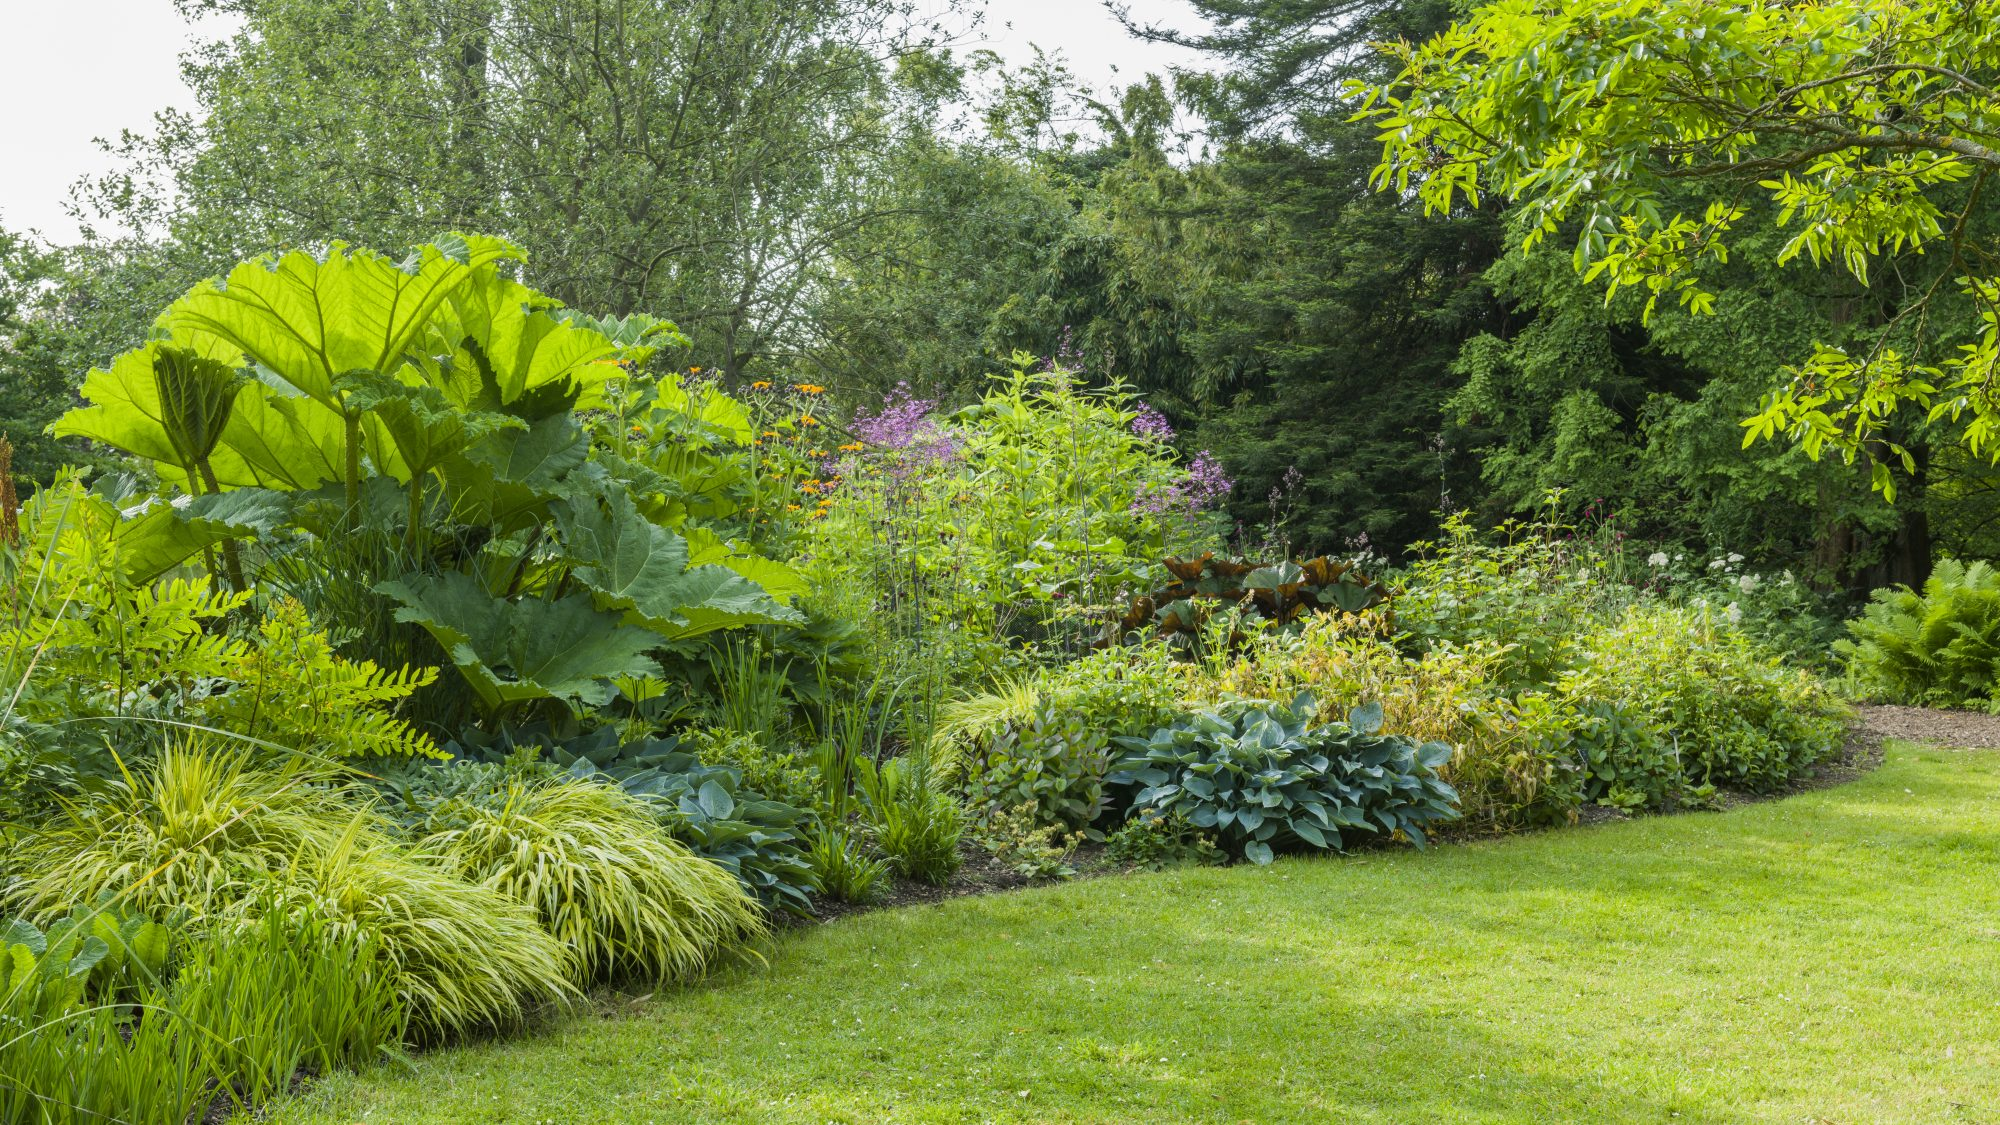 The Stream Garden bursting with summer foliage, including the giant Gunnera manicata.